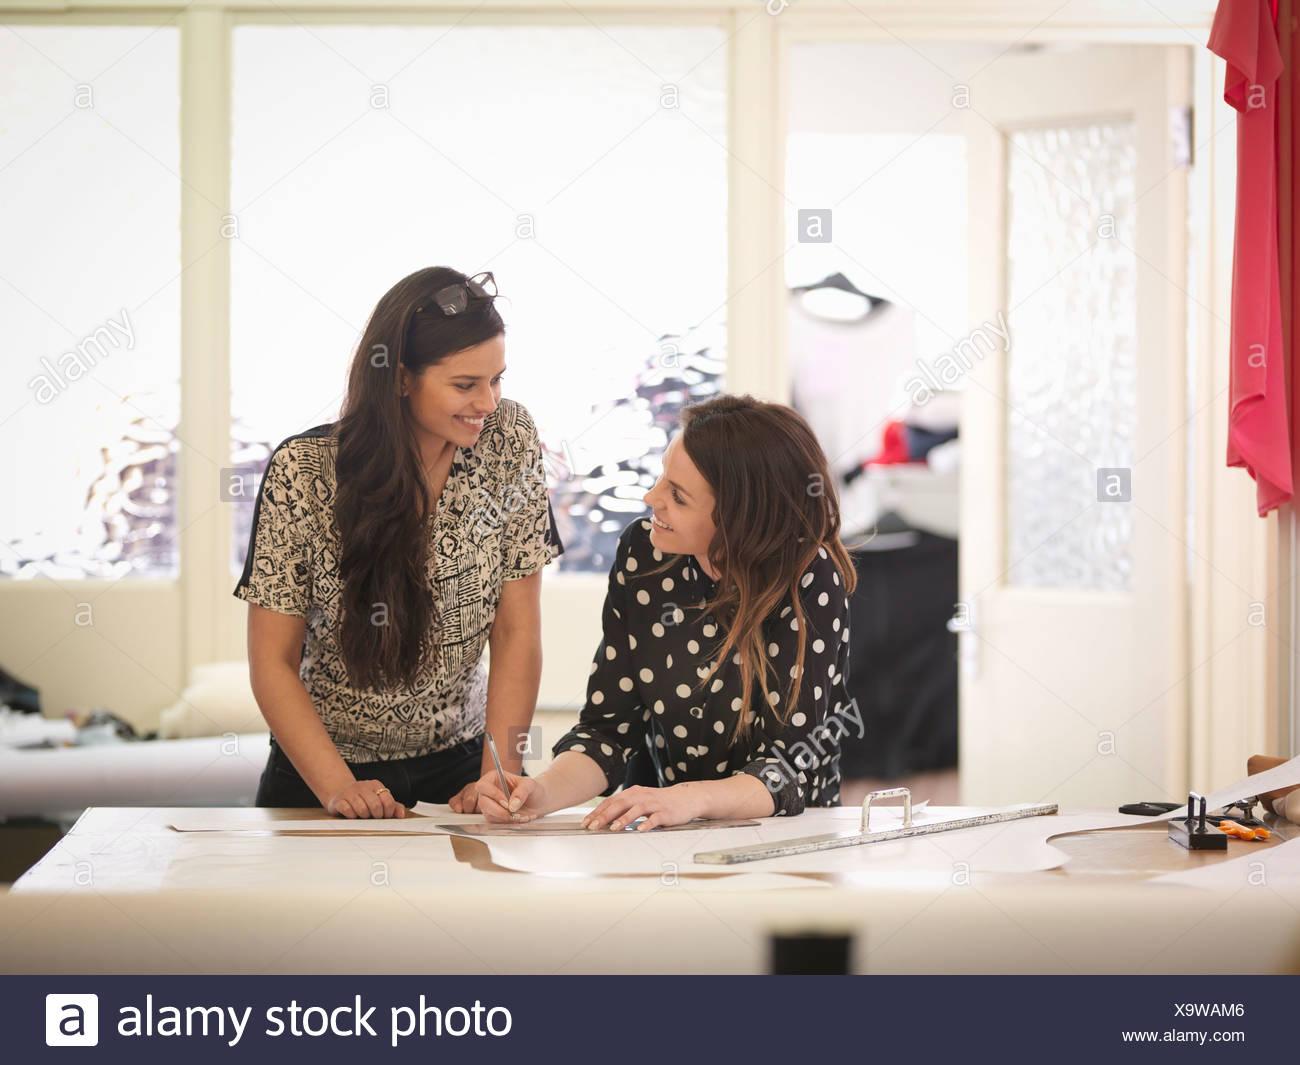 Fashion designers working together in fashion studio - Stock Image